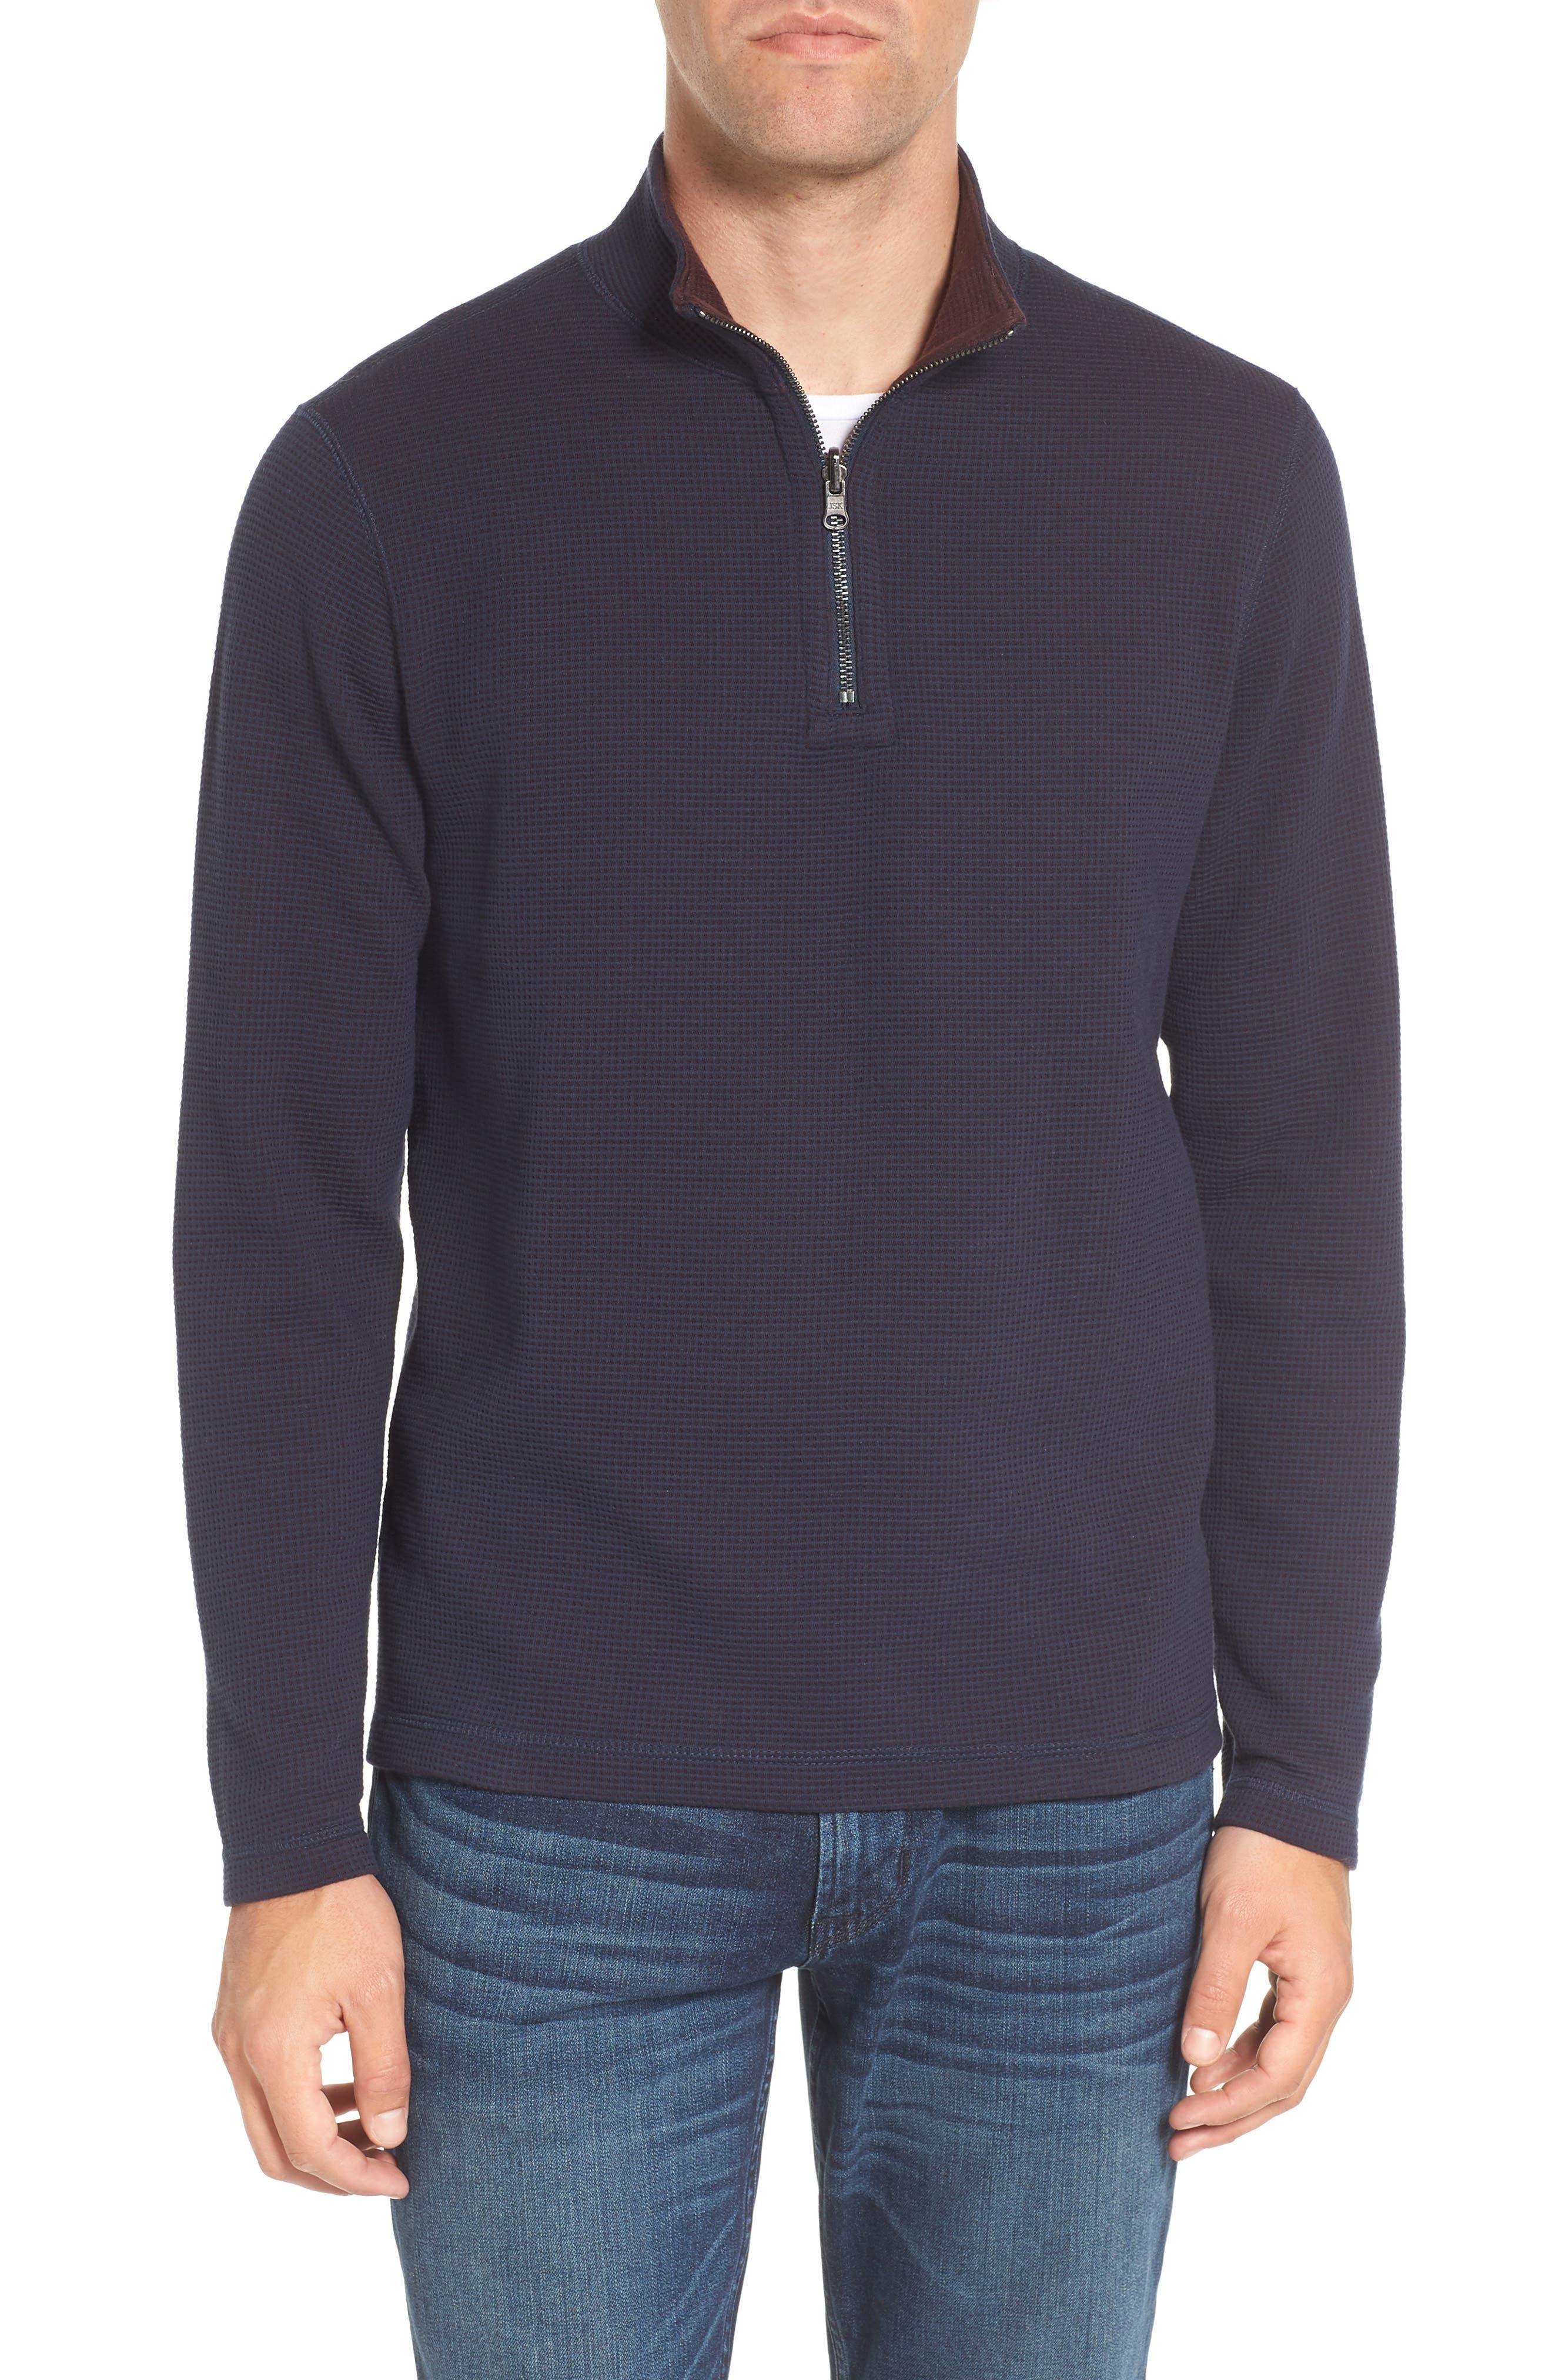 Main Image - Tailor Vintage Reversible Quarter Zip Pullover